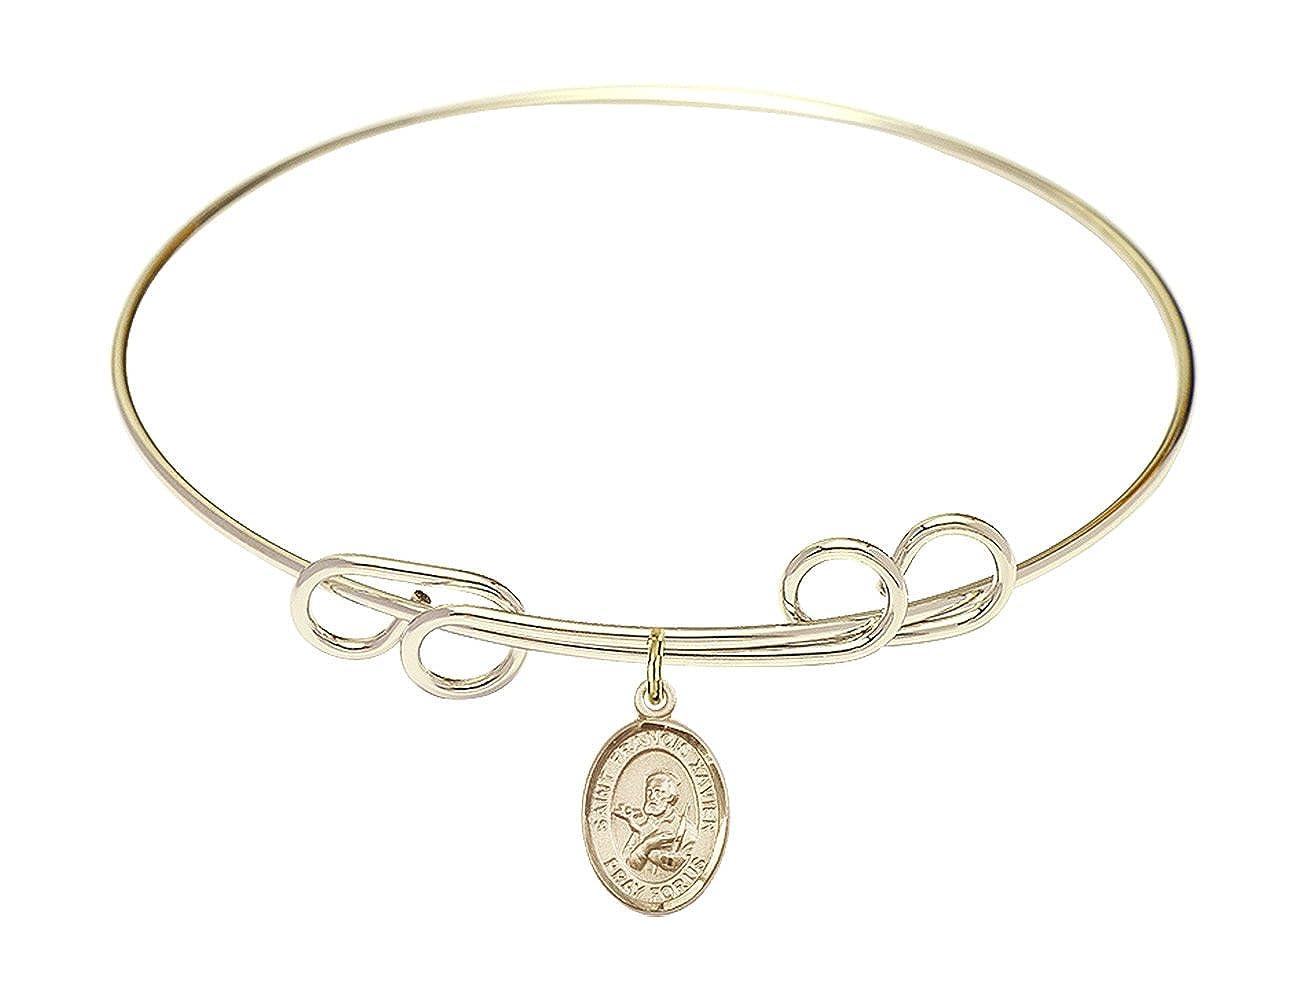 Francis Xavier Charm. DiamondJewelryNY Double Loop Bangle Bracelet with a St